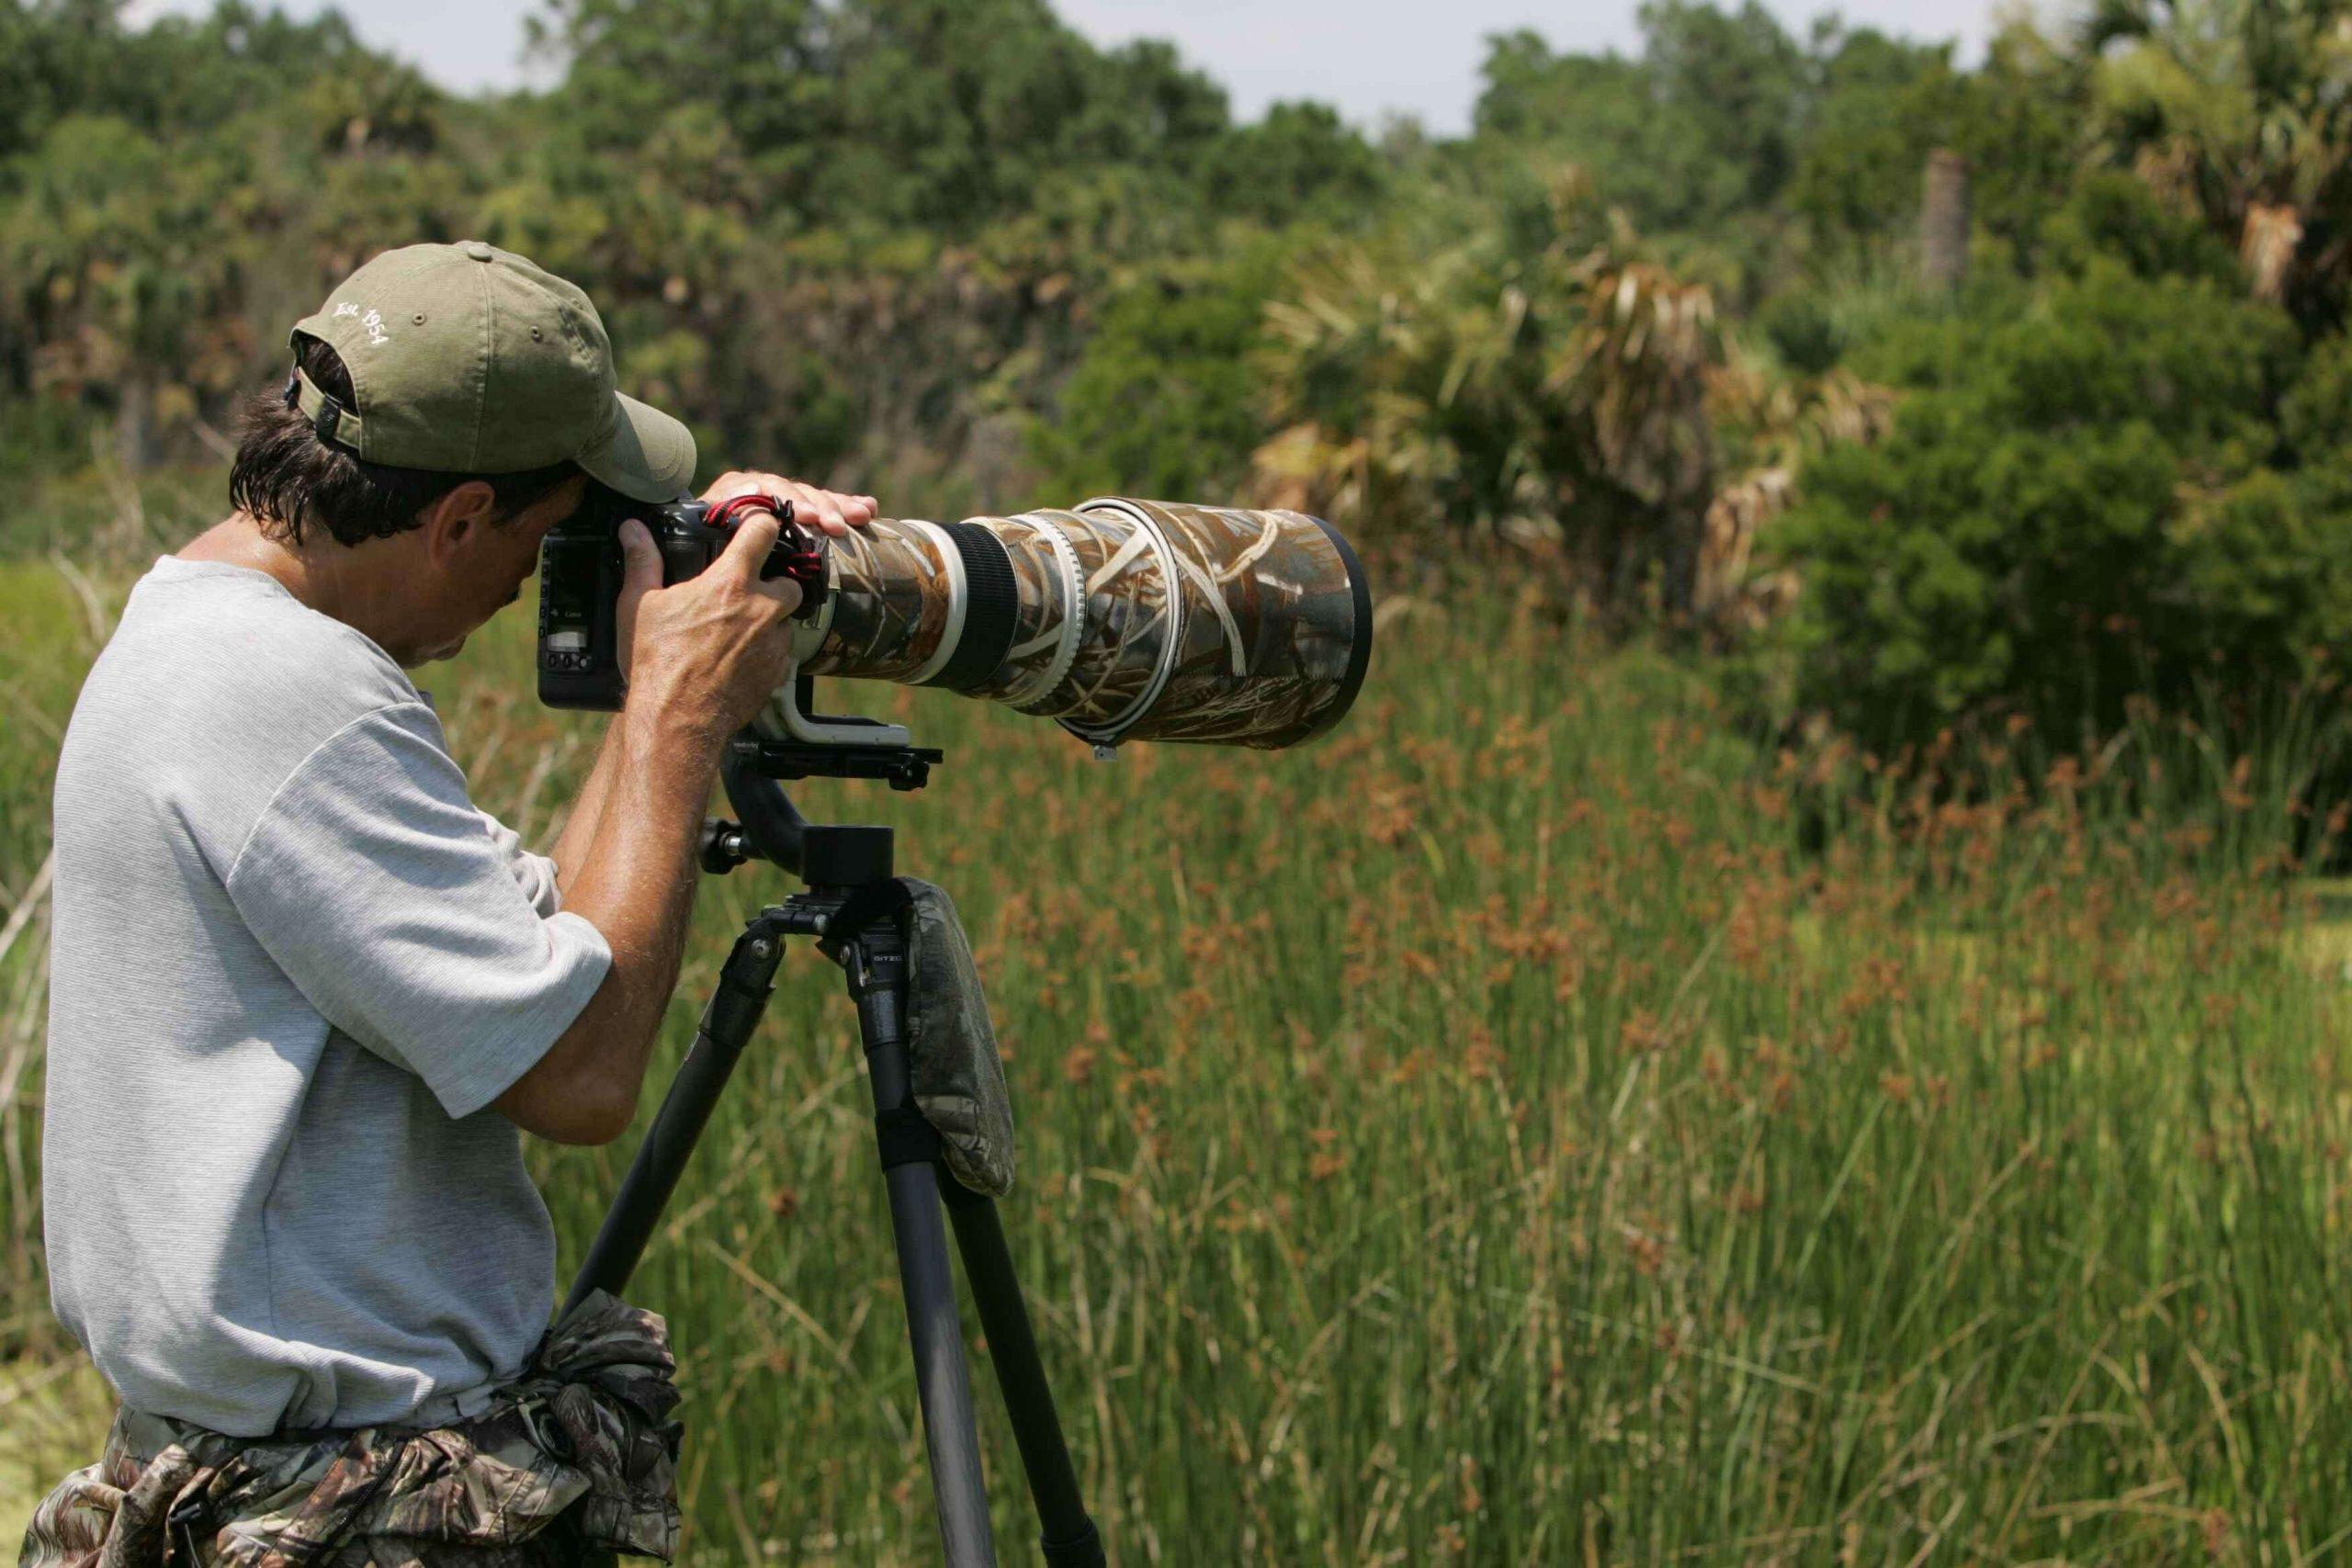 safari photographer with a mega lens